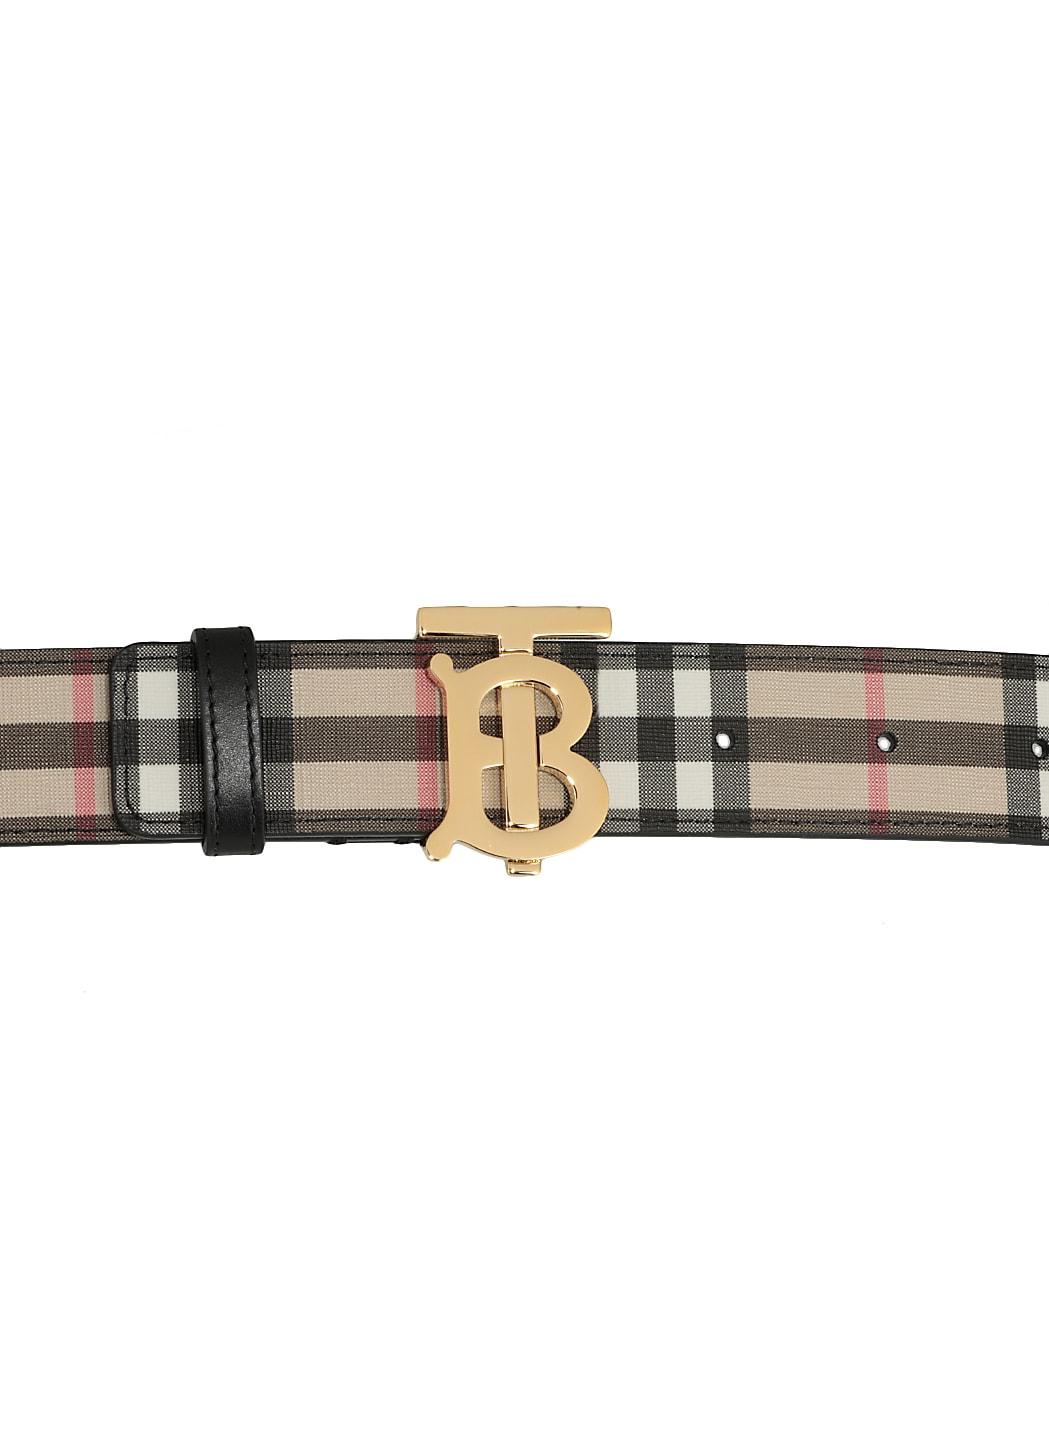 Burberry Belts MONOGRAM MOTIF BELT